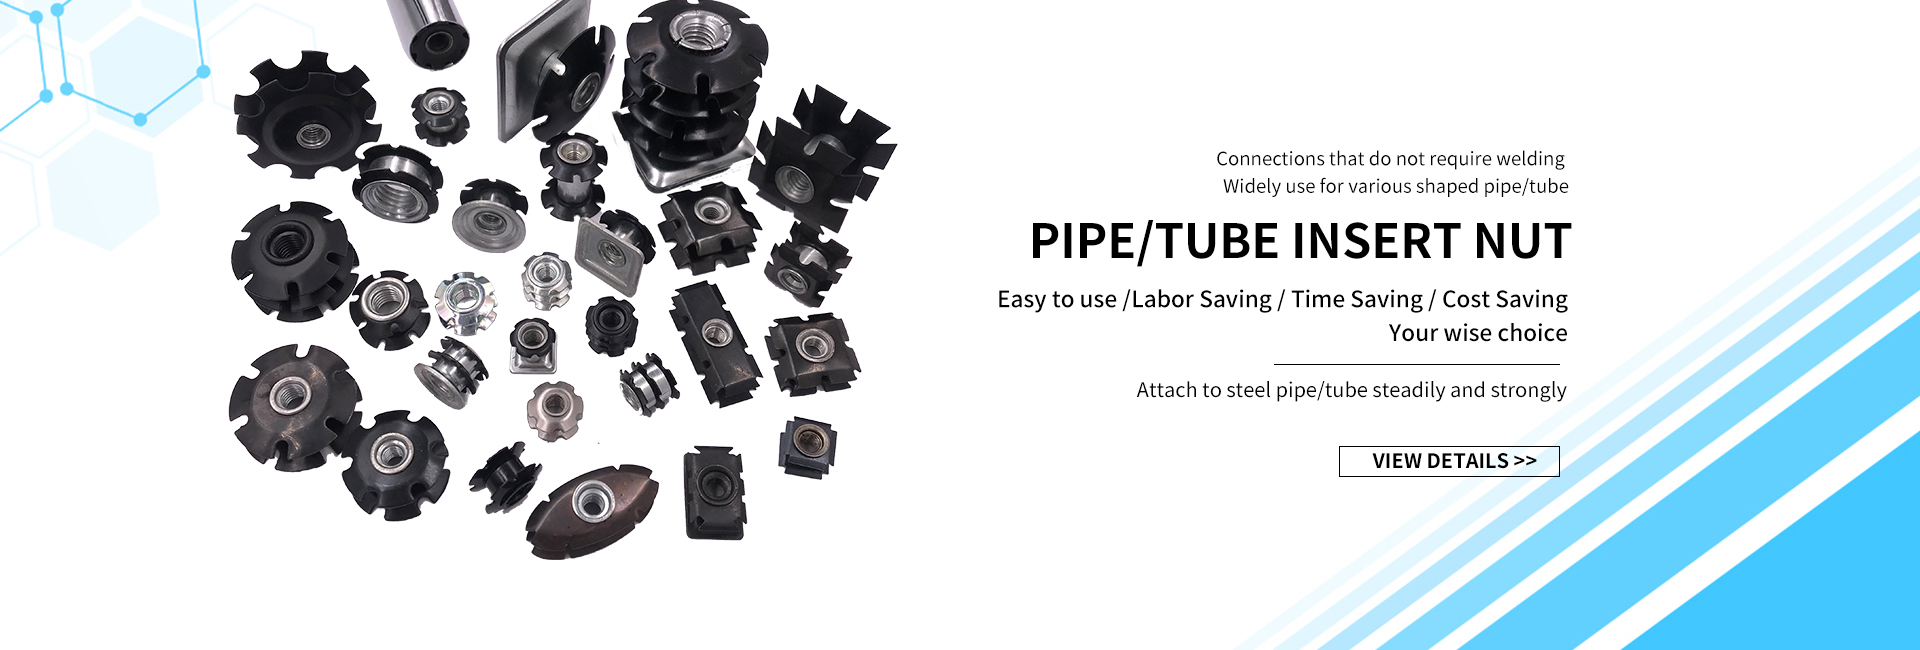 Draht Regale Post Ecke Halterung Hülse | Carbon Stahl | 12,7mm-25,4mm